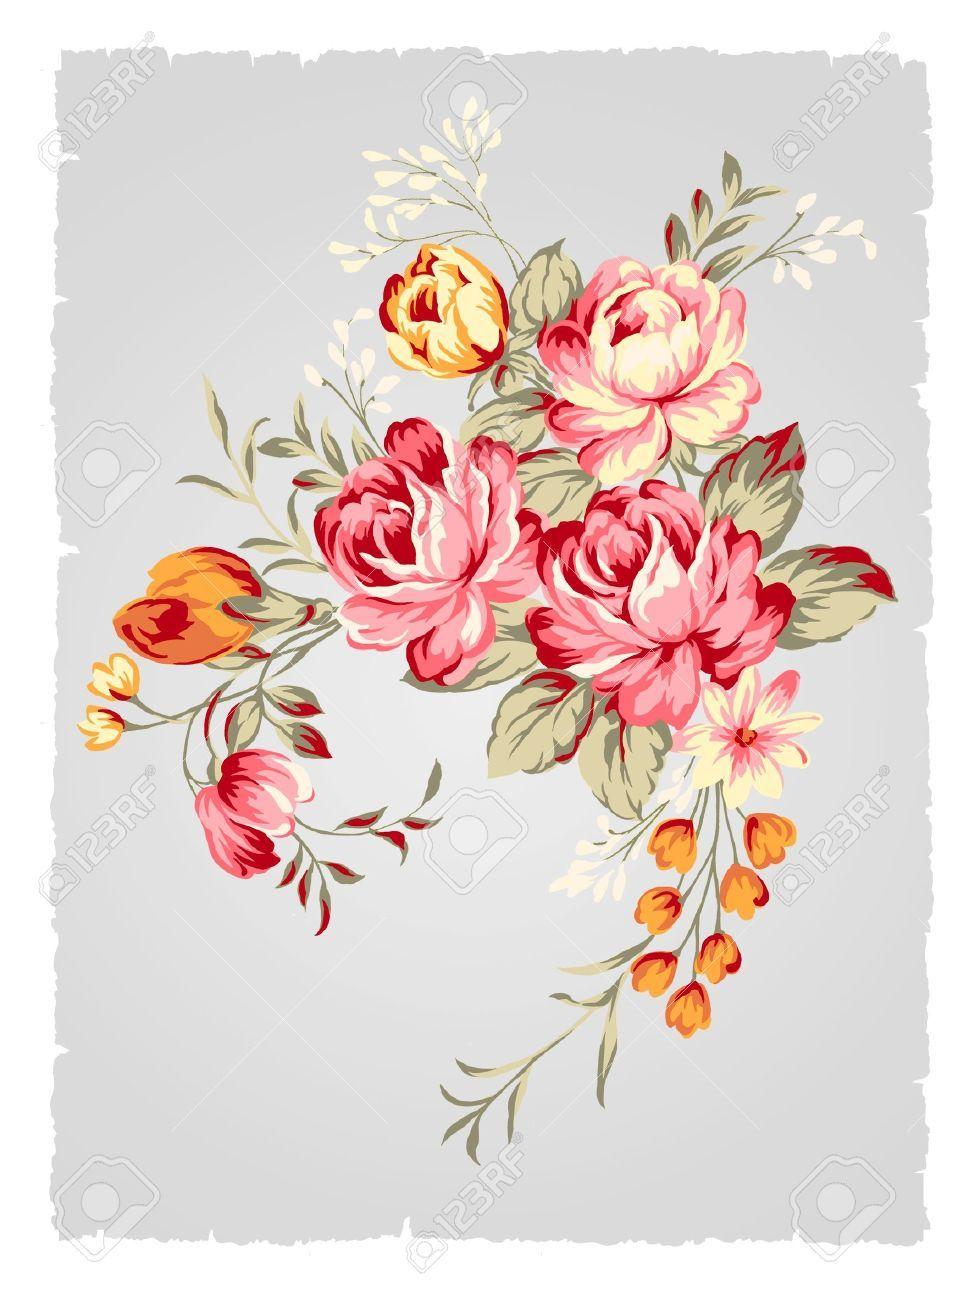 Simple Flower Designs For Painting   www.pixshark.com ...